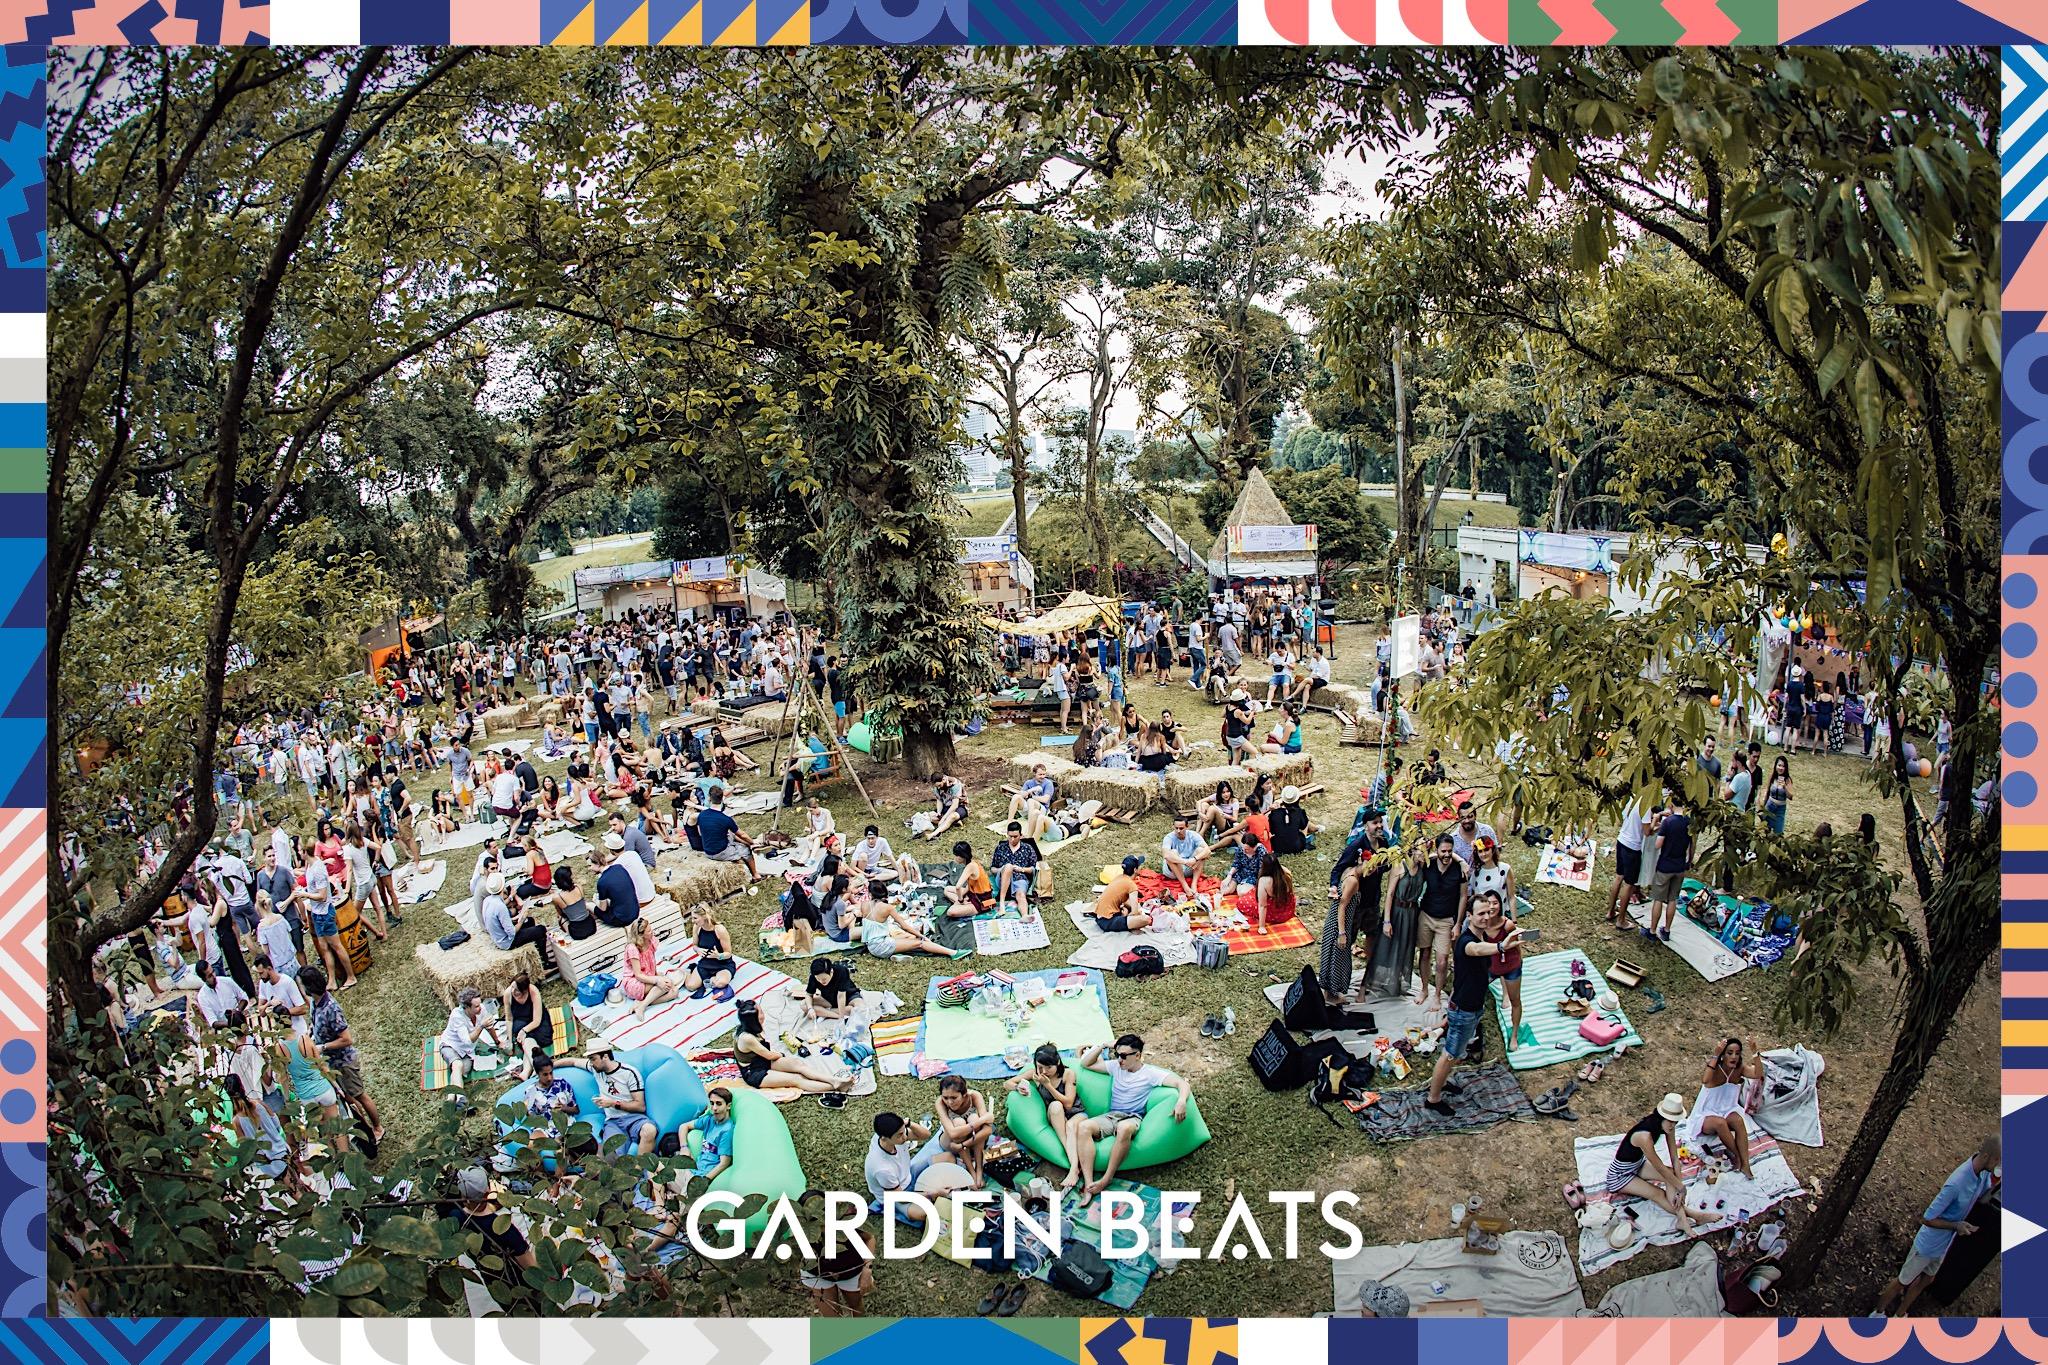 18032017_GardenBeats_Colossal647_WatermarkedGB.jpg